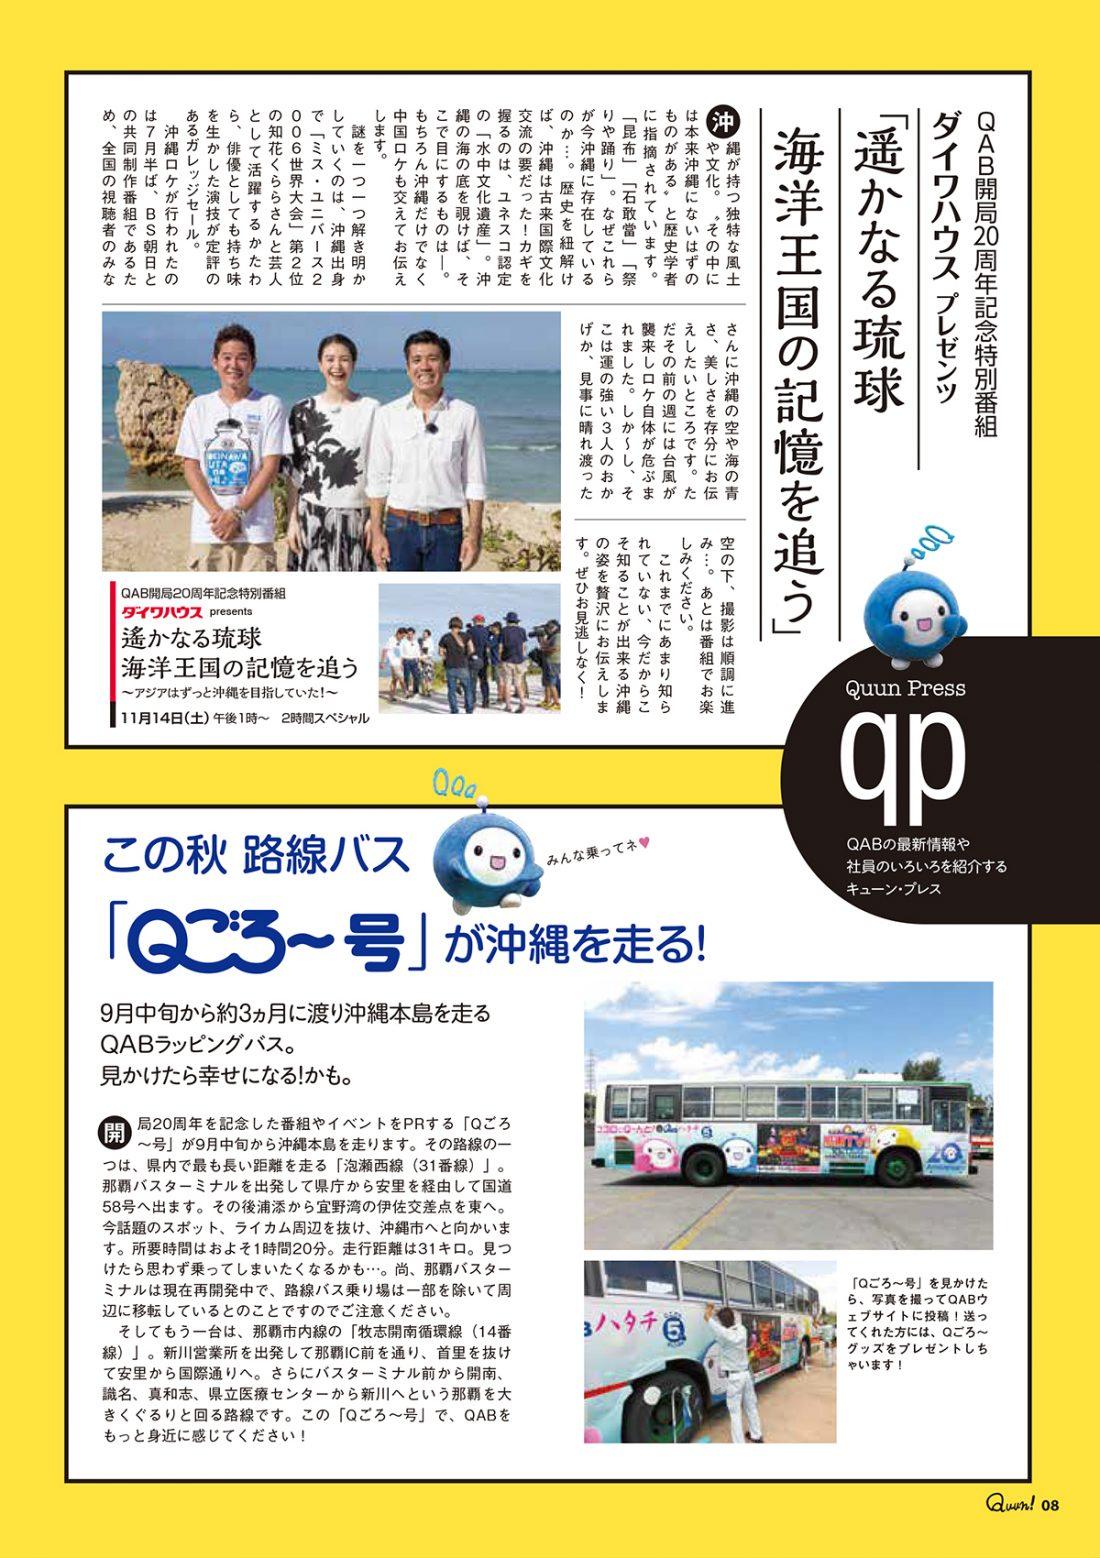 https://www.qab.co.jp/qgoro/wp-content/uploads/quun_0410-1100x1558.jpg